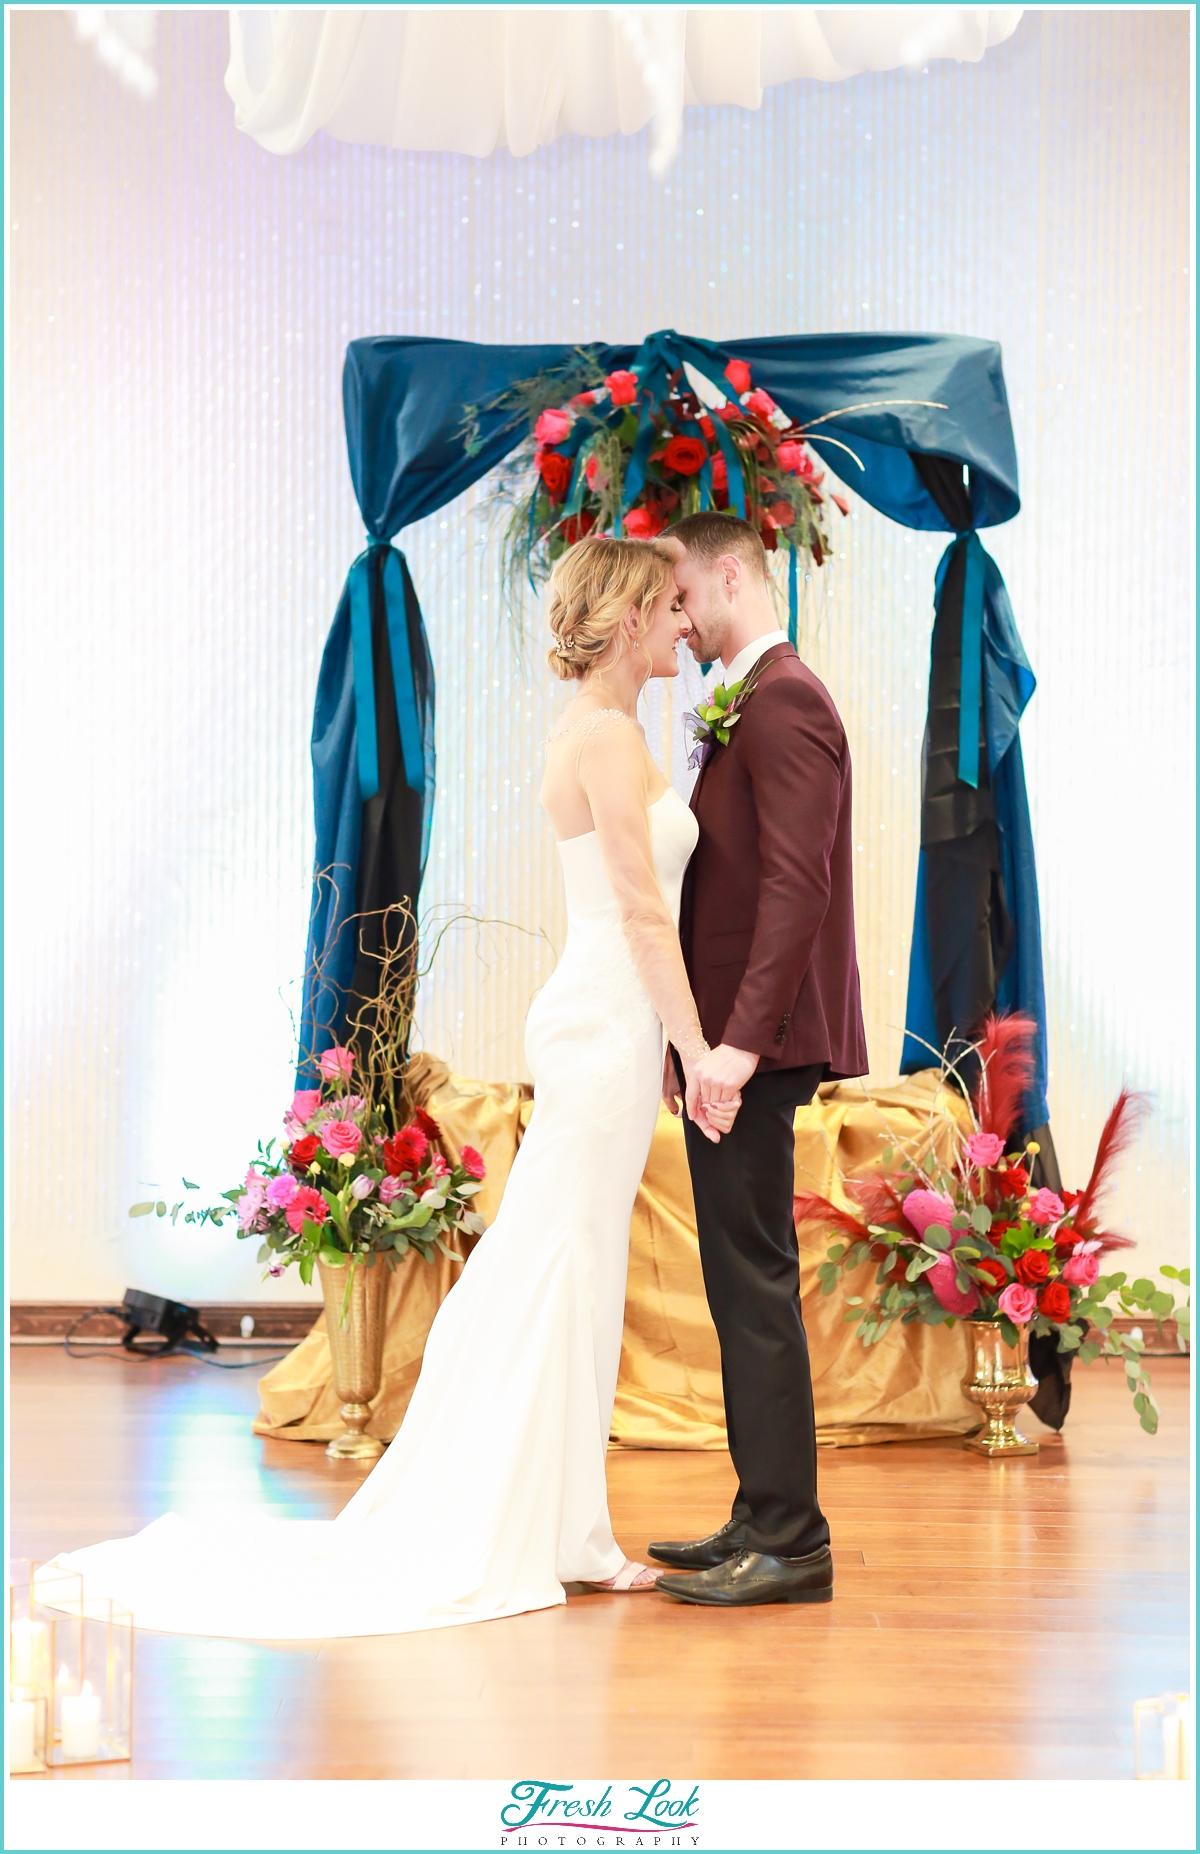 romantic kiss at the wedding